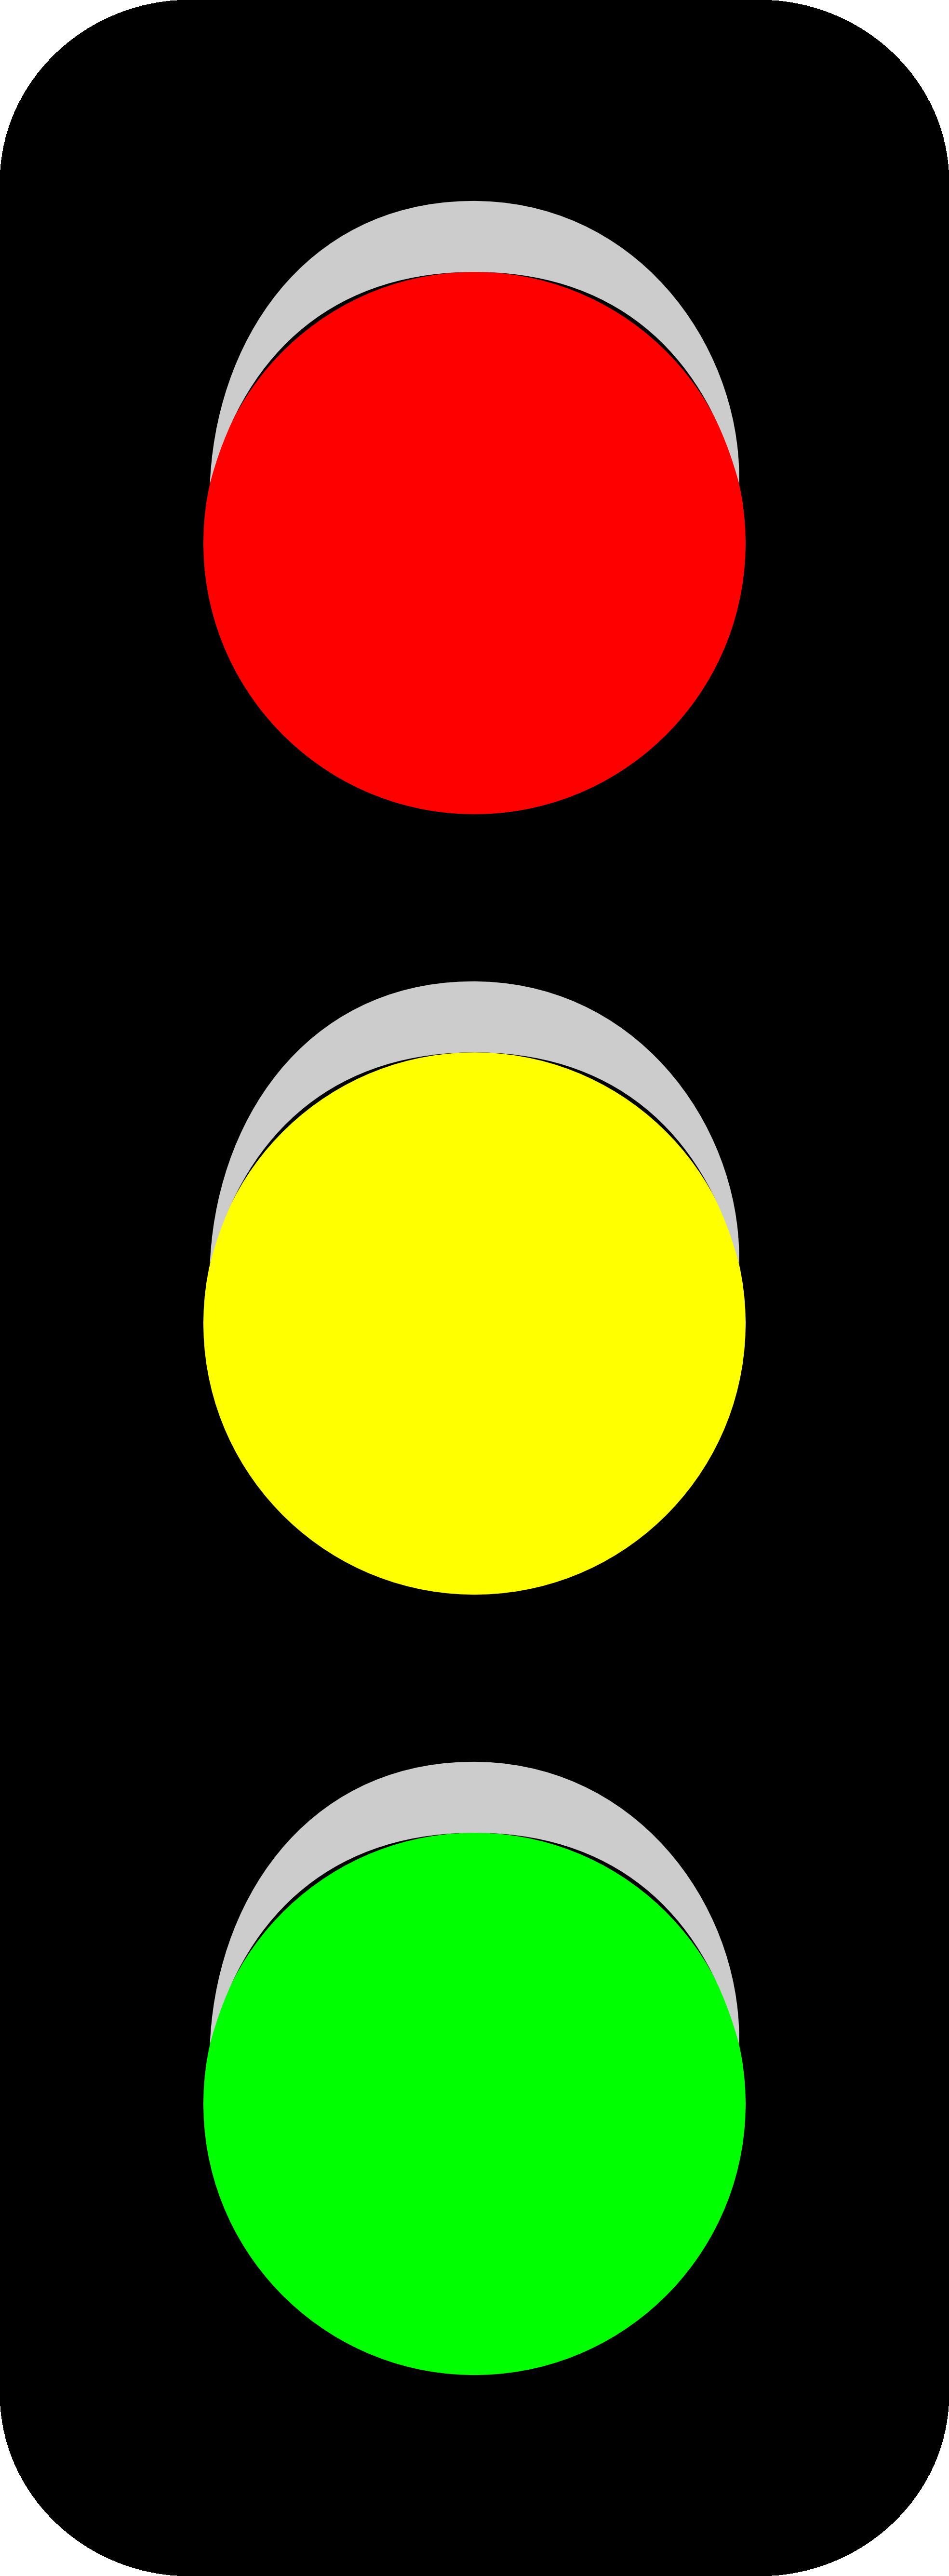 Traffic Light clipart traffic signal Clipart Clipart Panda Light Free